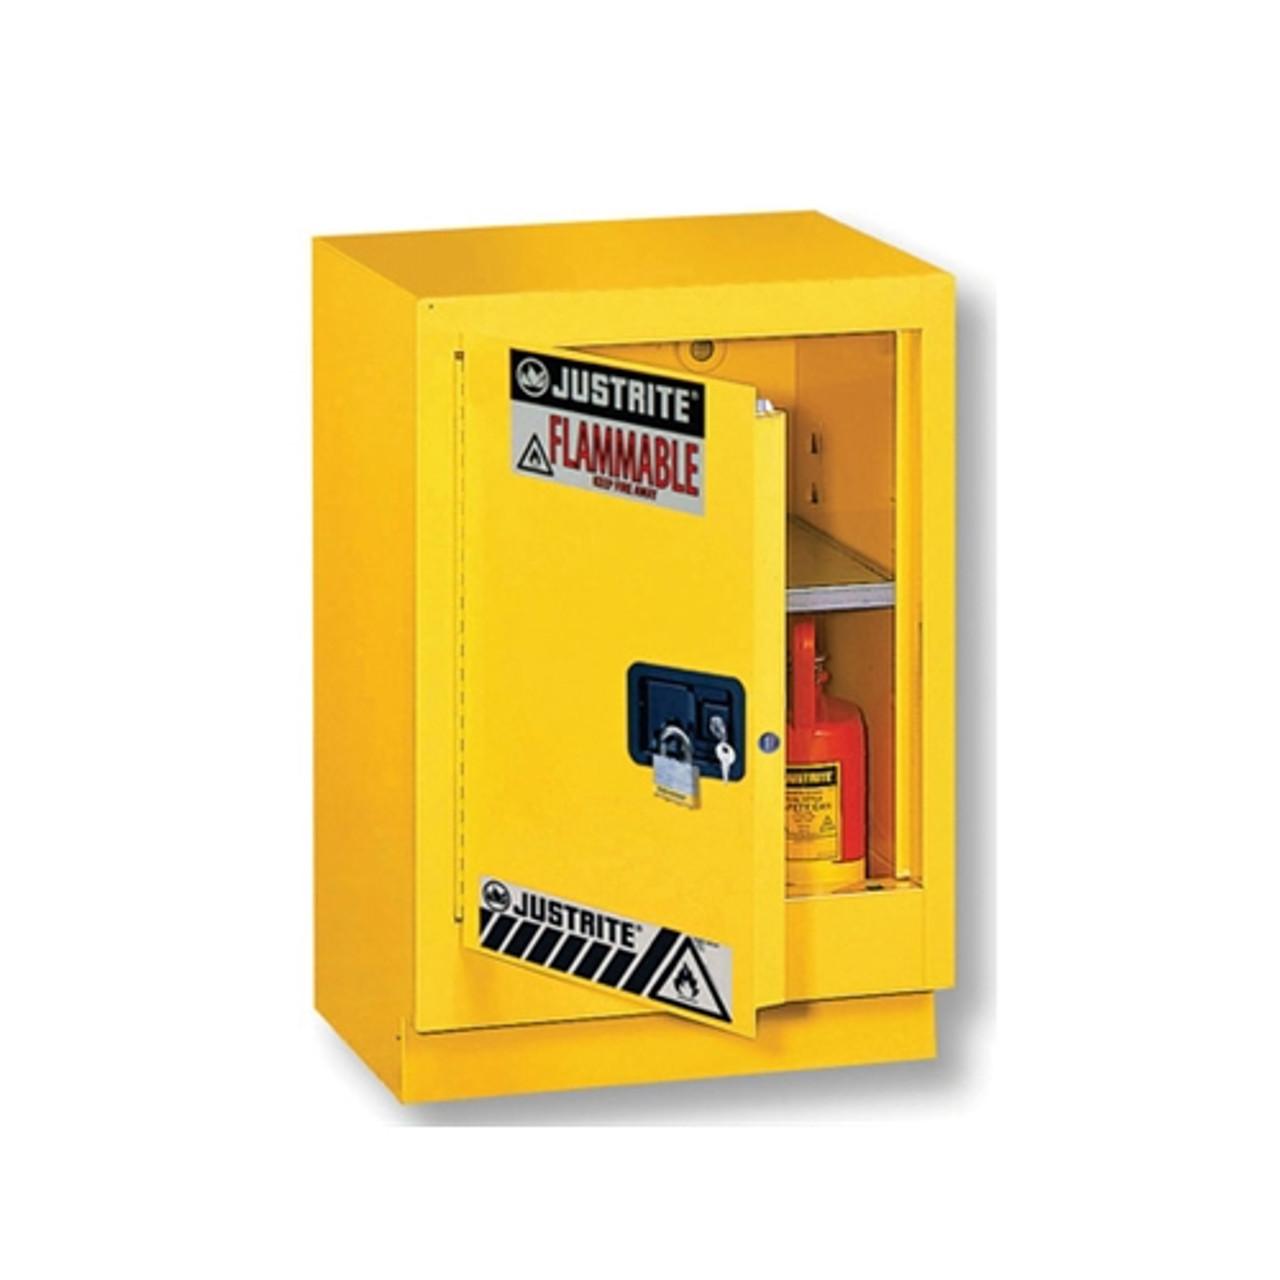 Justrite 882430 Flammable Cabinet Cap 15 Gal